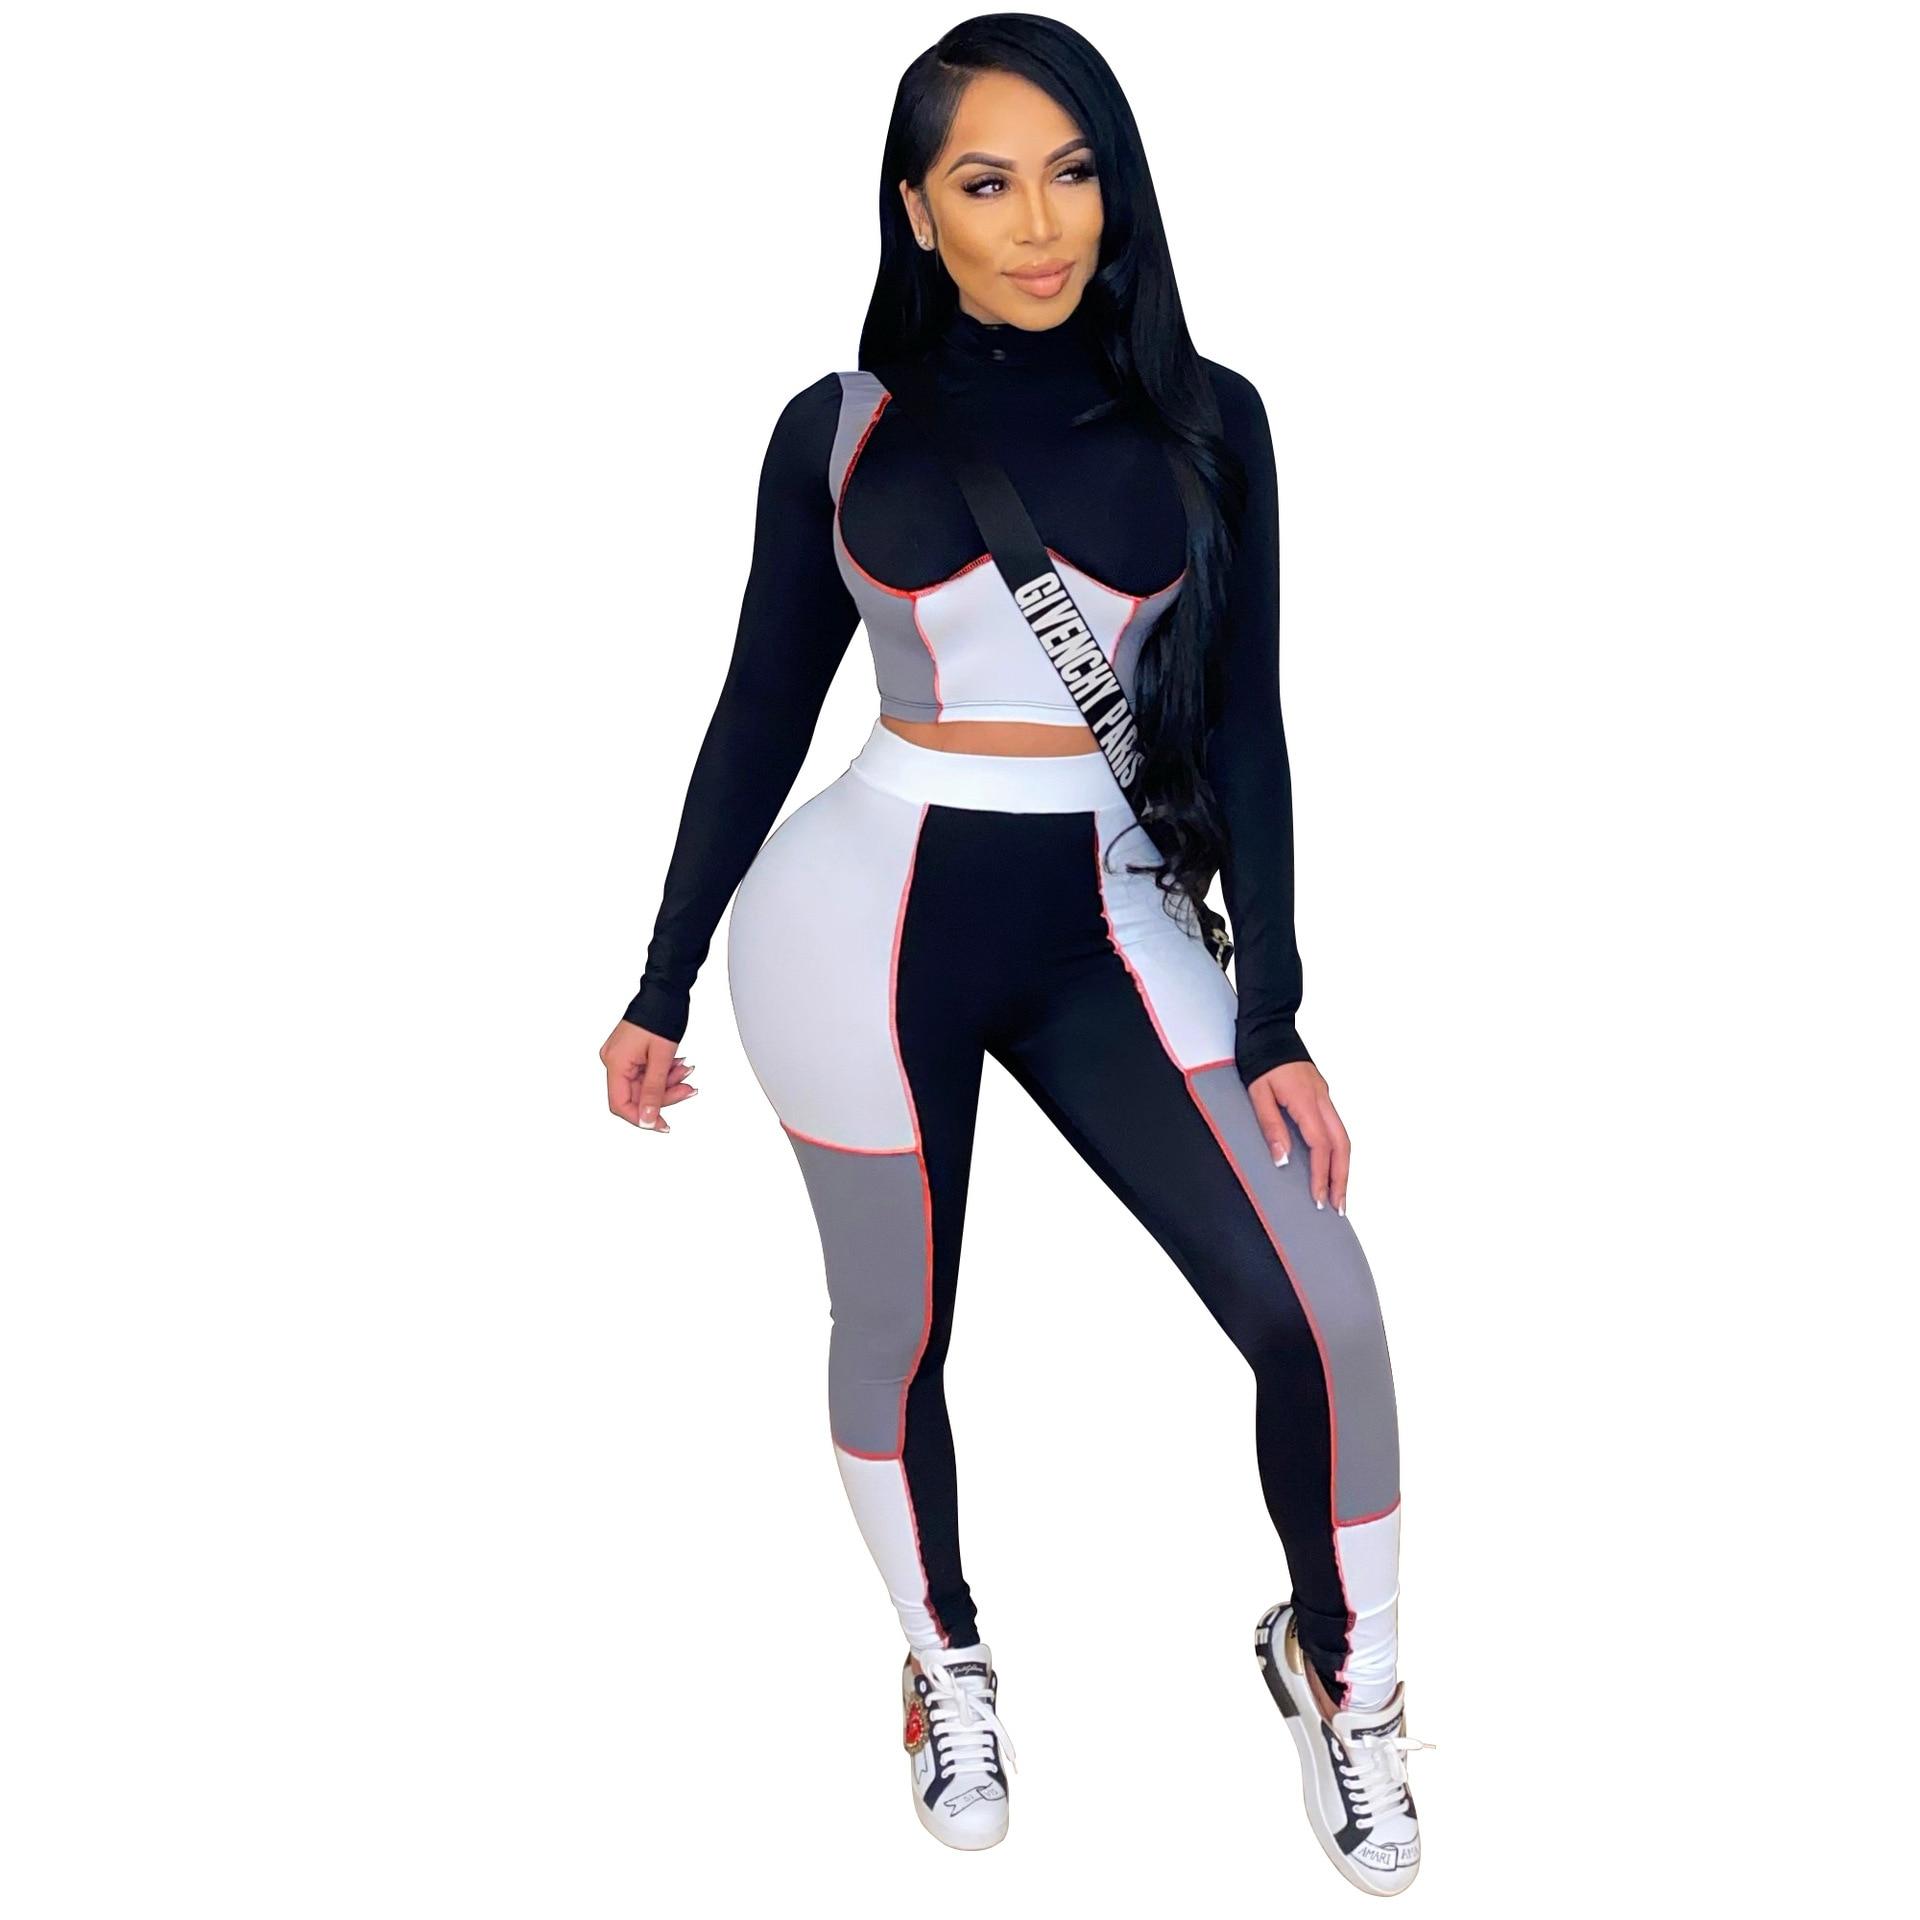 Casual Zwei Stück Set Frauen Farbe Patchwork Volle Hülse Shirt Crop Top + Lange Hose Trainingsanzug Sportsuit Kleidung Für Frauen outfit